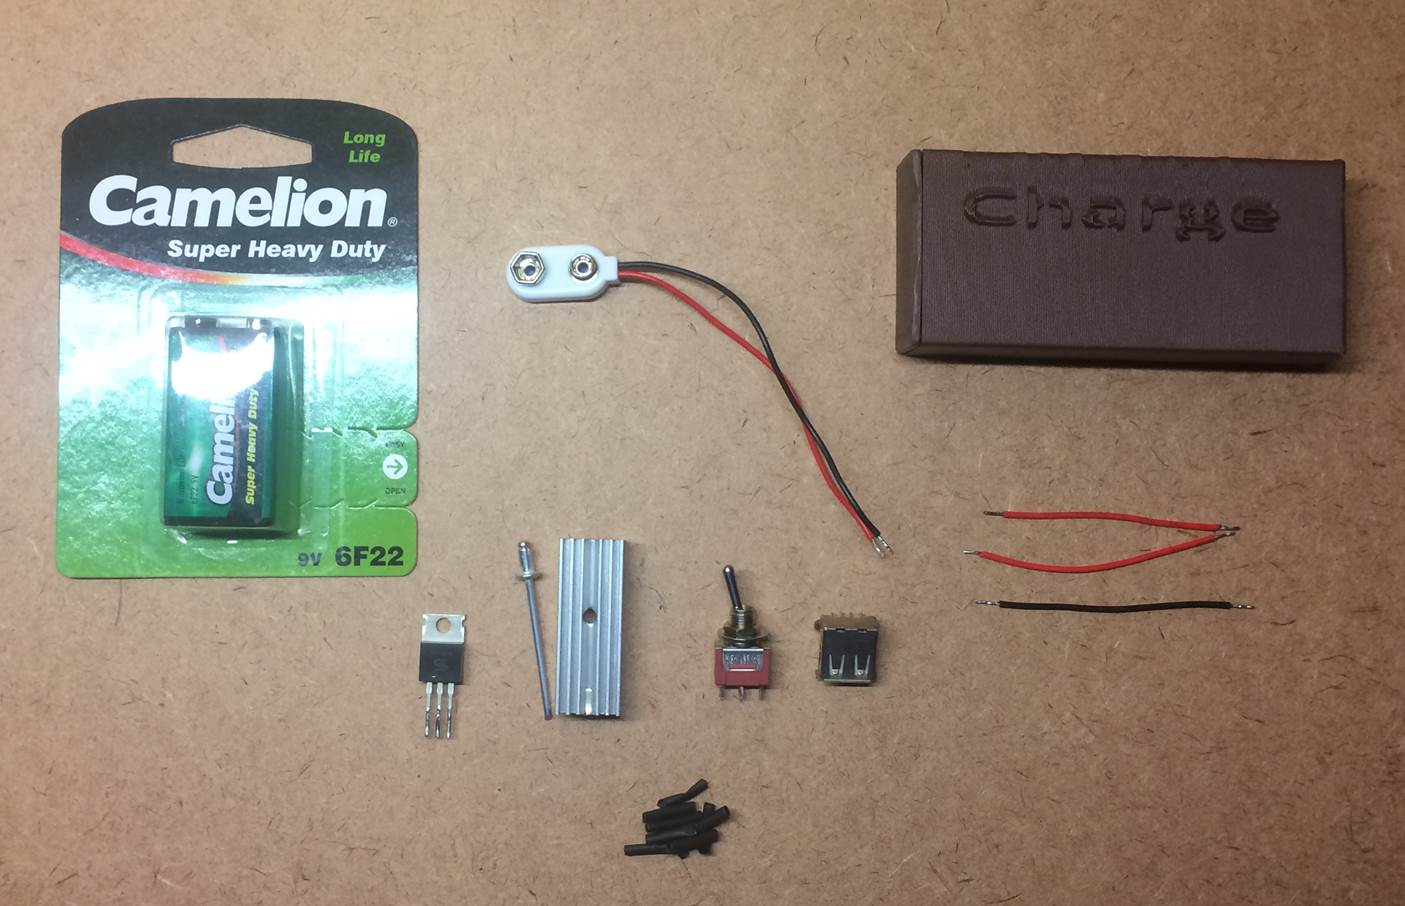 Make A Super Easy 9v Emergency Usb Charger The Diy Life Simple 9volt Positive Voltage Regulator Components Required